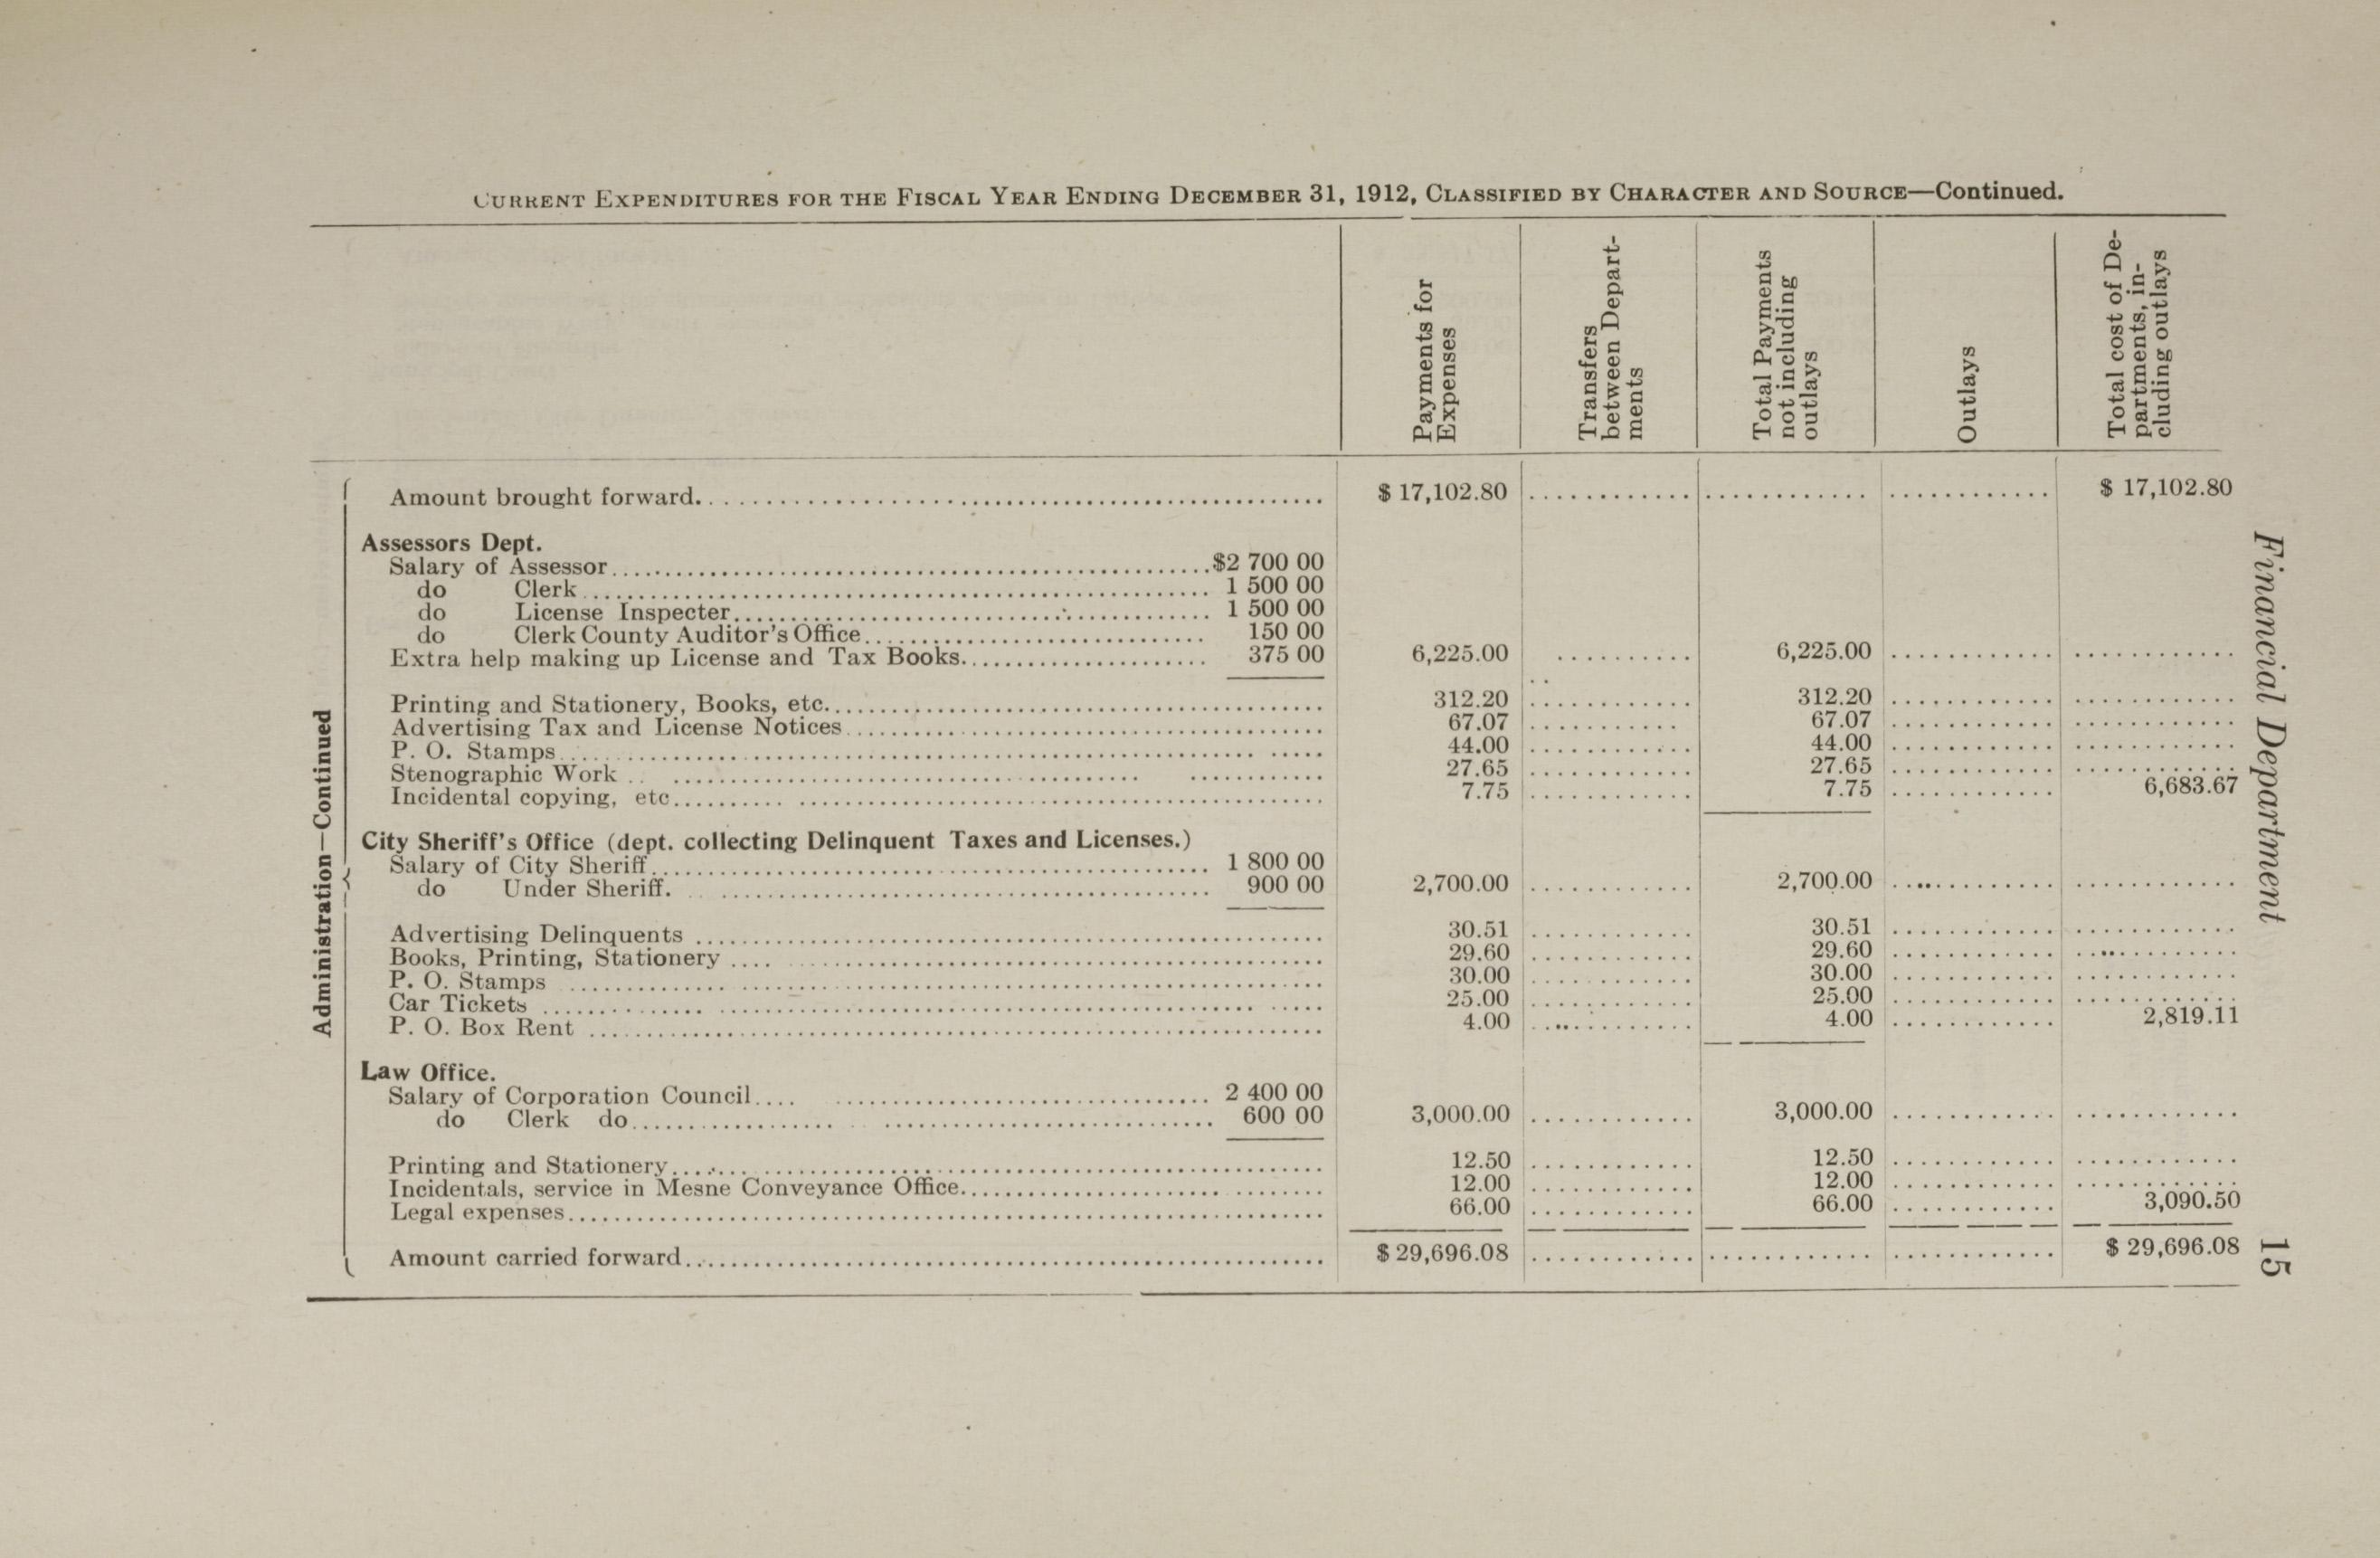 Charleston Yearbook, 1912, page 15